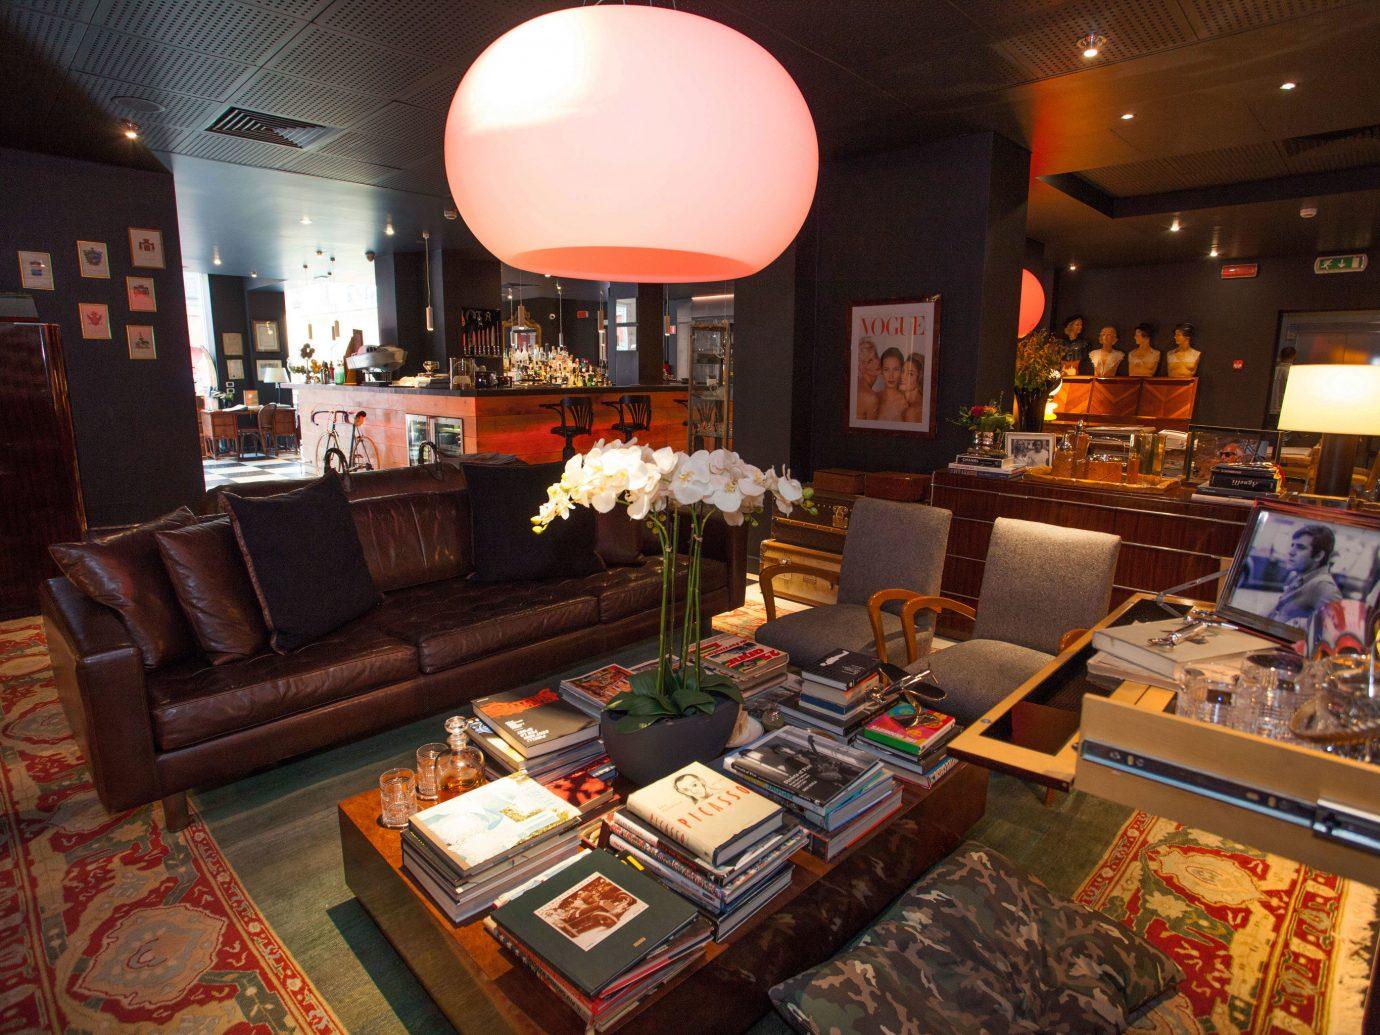 Hotels Italy Milan indoor Living room ceiling meal interior design Bar restaurant furniture